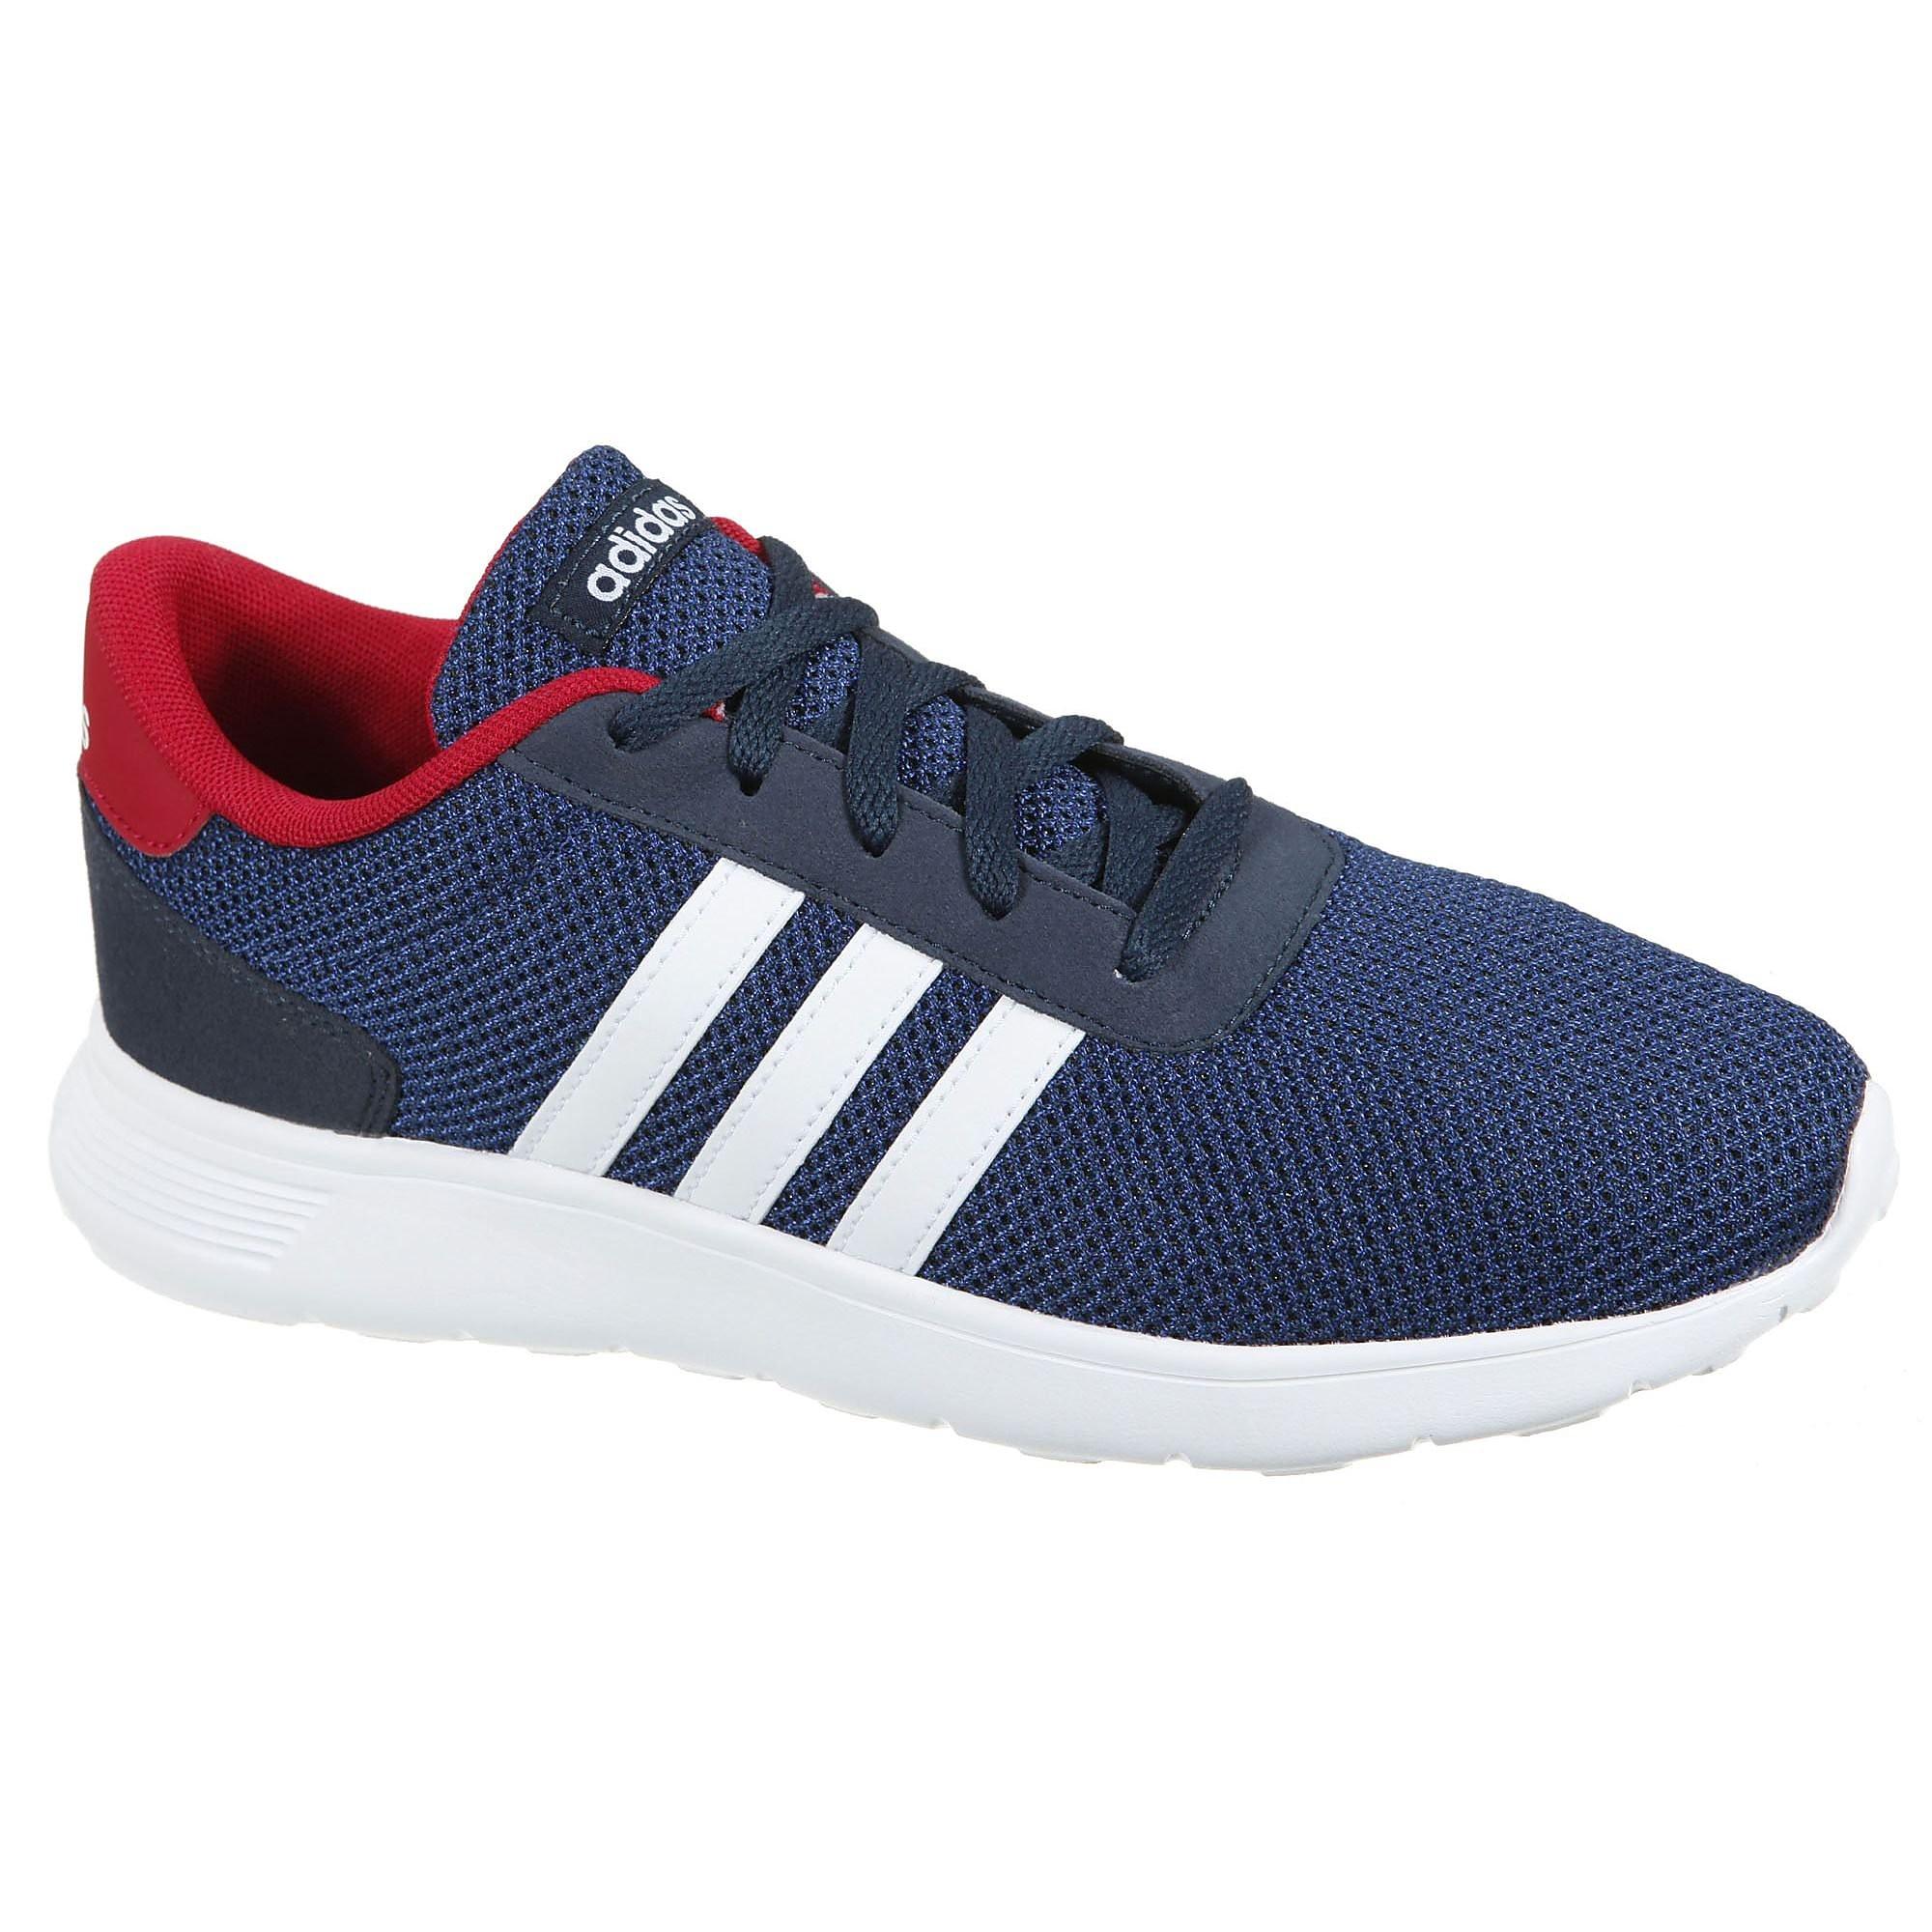 Sportschoenen adidas AW5124